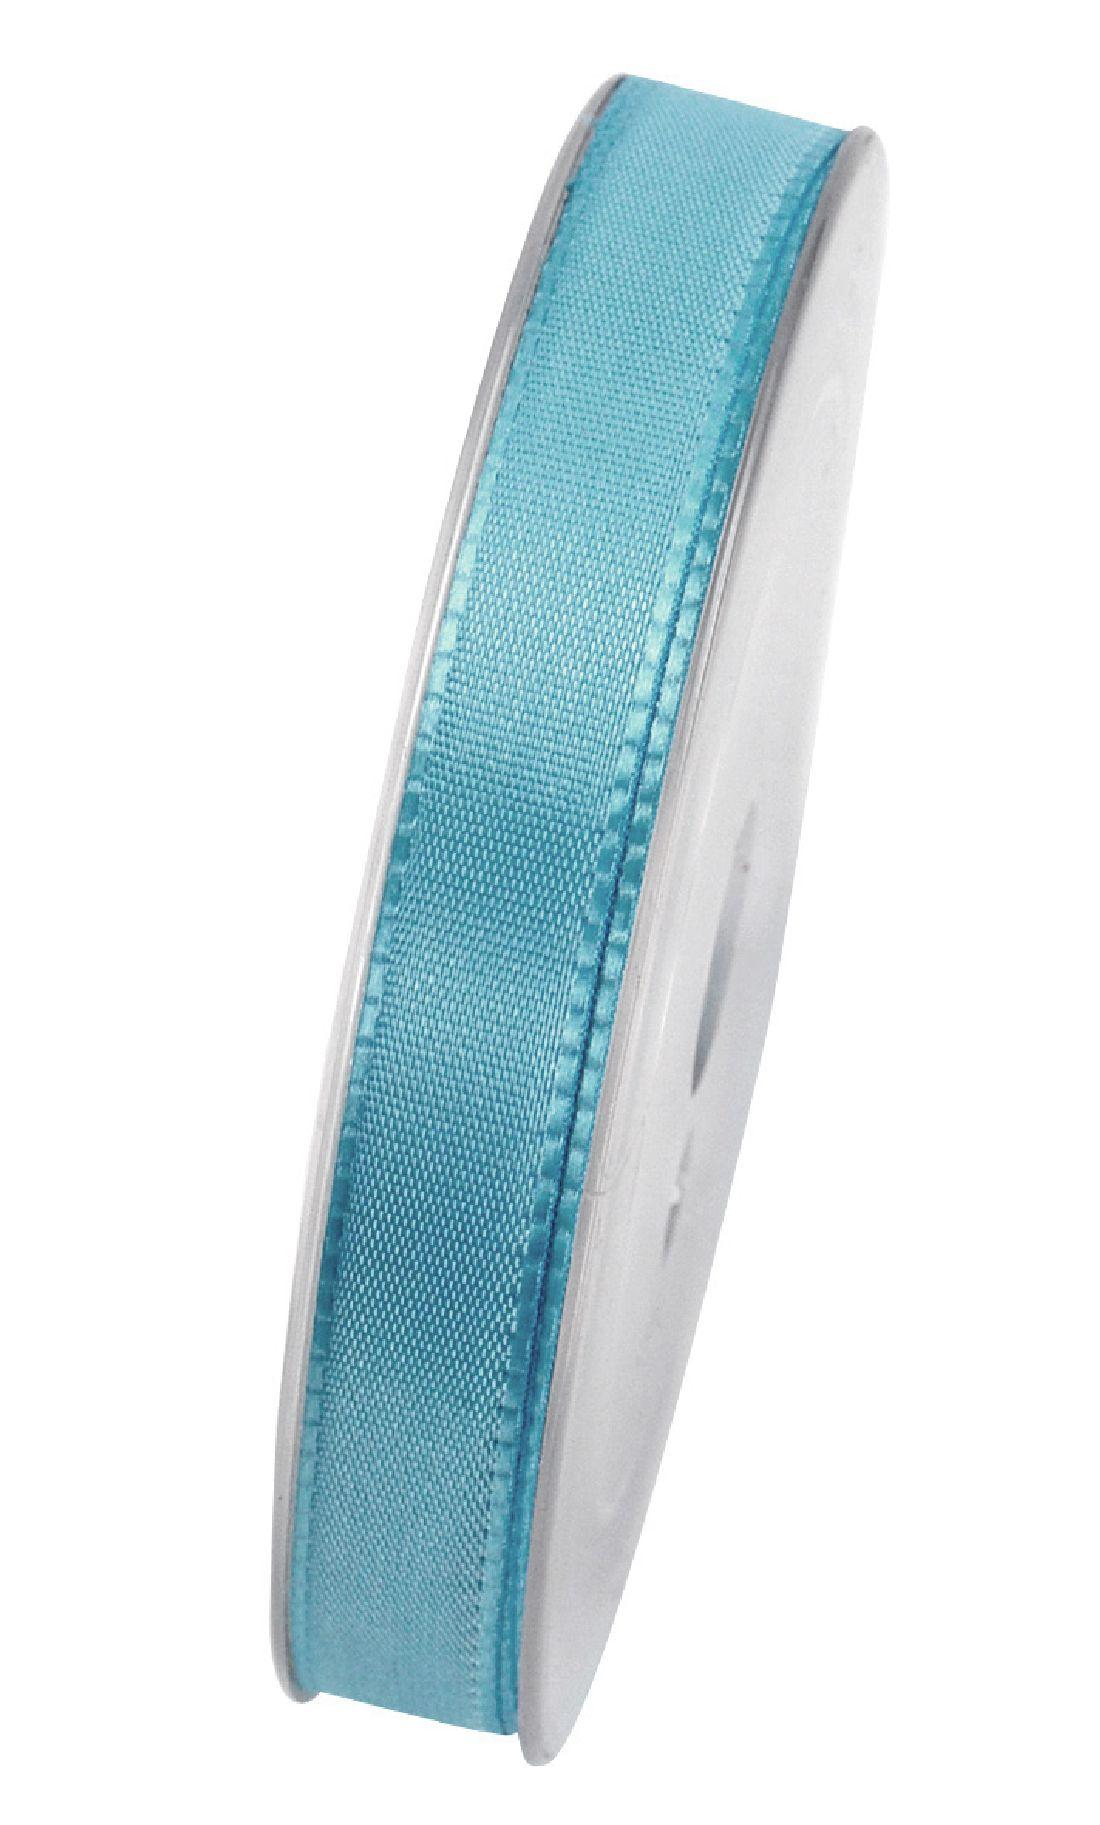 Basic ohne Draht / Taftband TÜRKIS 377 15mm 50m